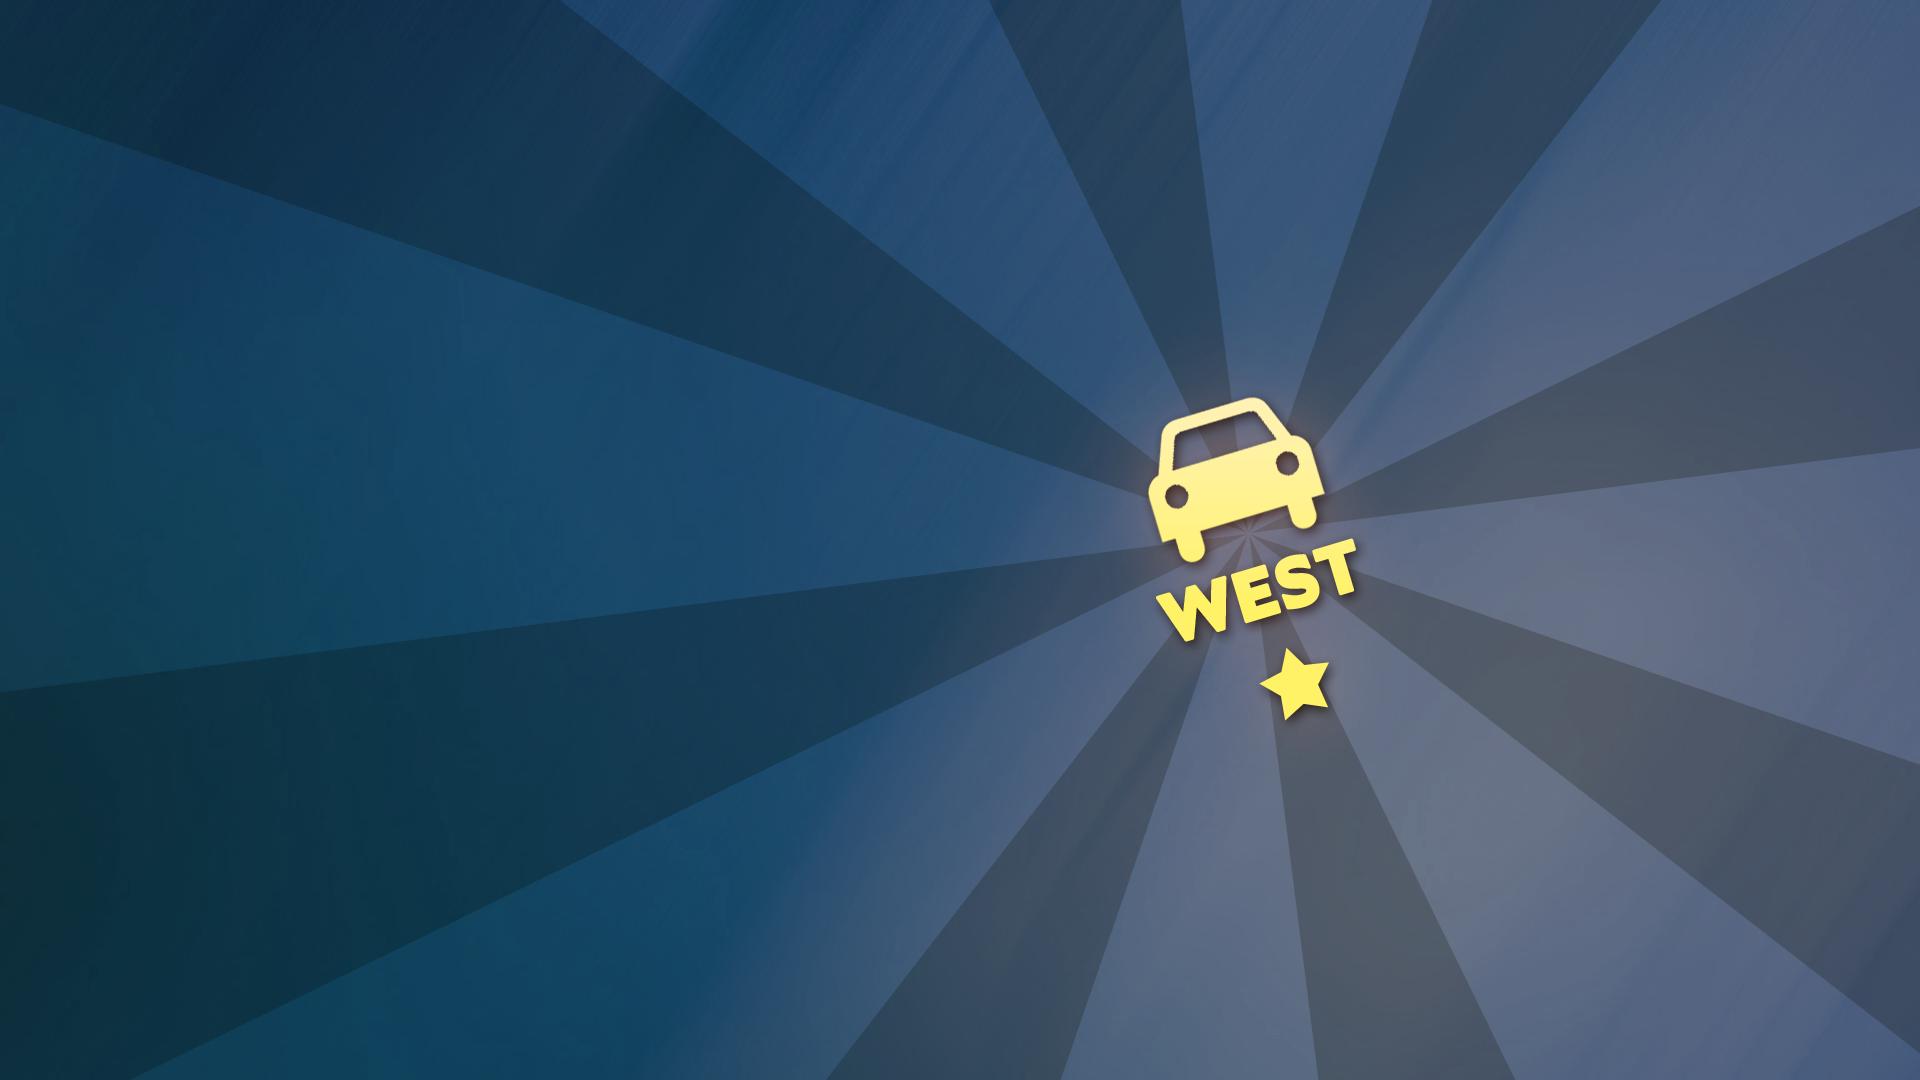 Car insignia 'West'